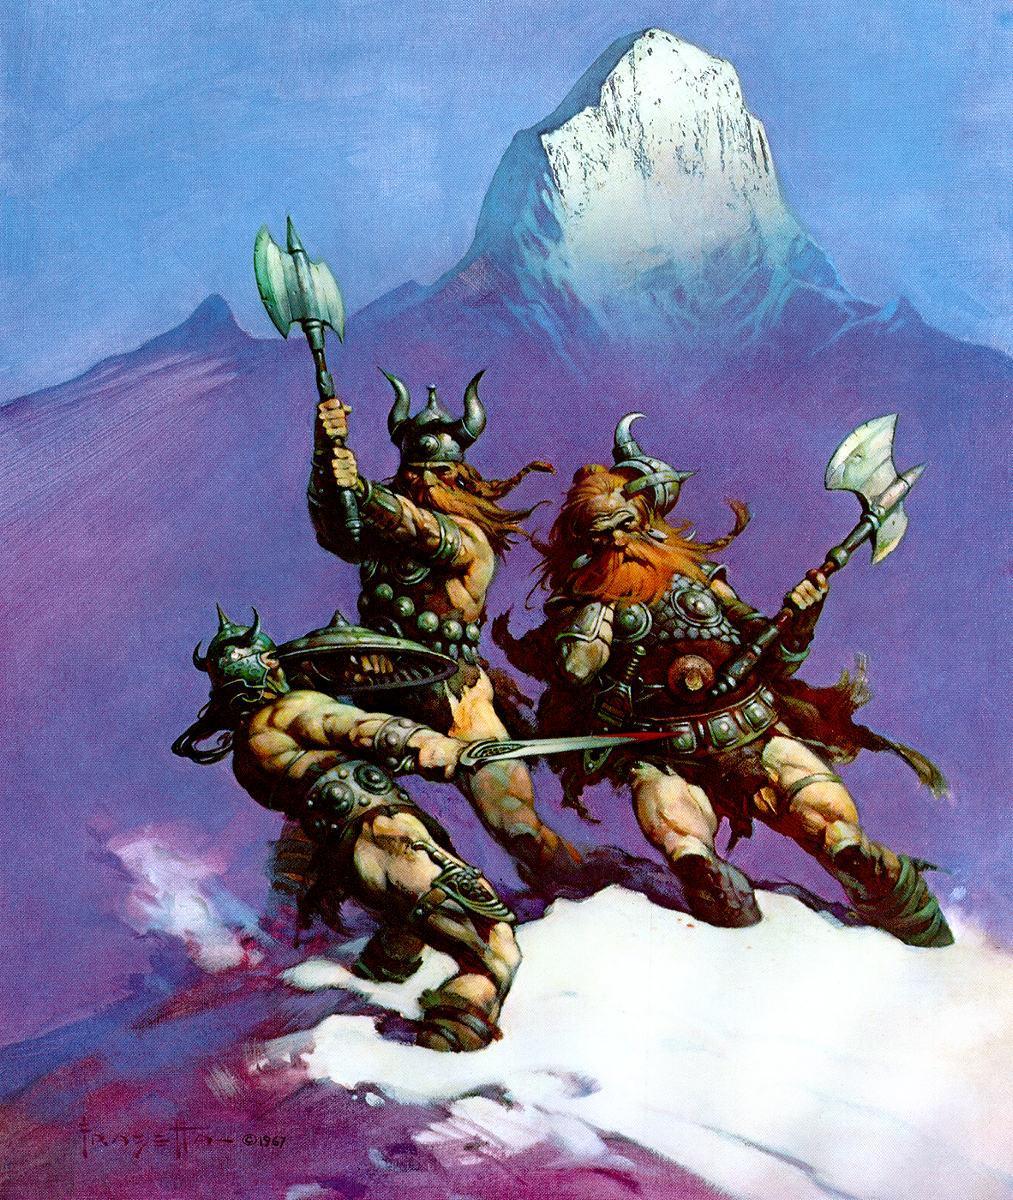 Images Frank Frazetta Battle axes Man Warriors Fight Fantasy 1013x1200